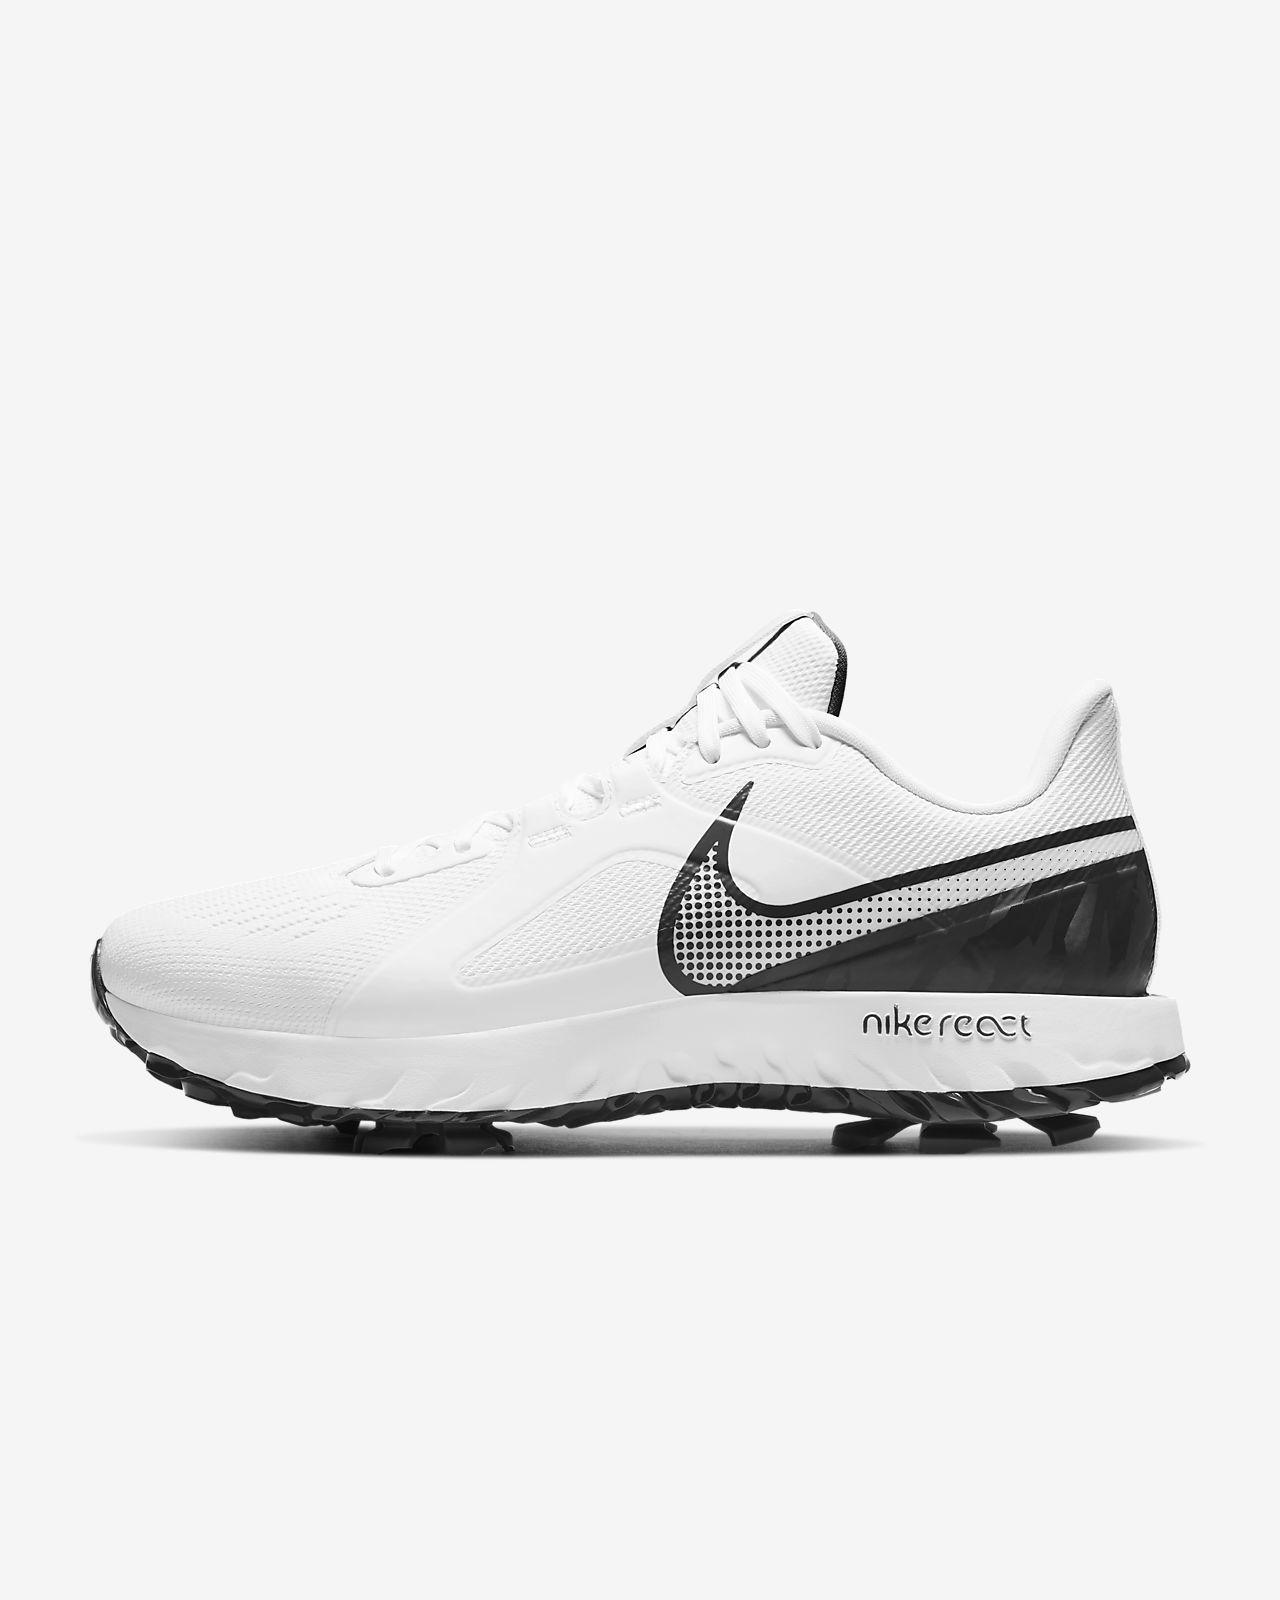 Nike React Infinity Pro Golf Shoe